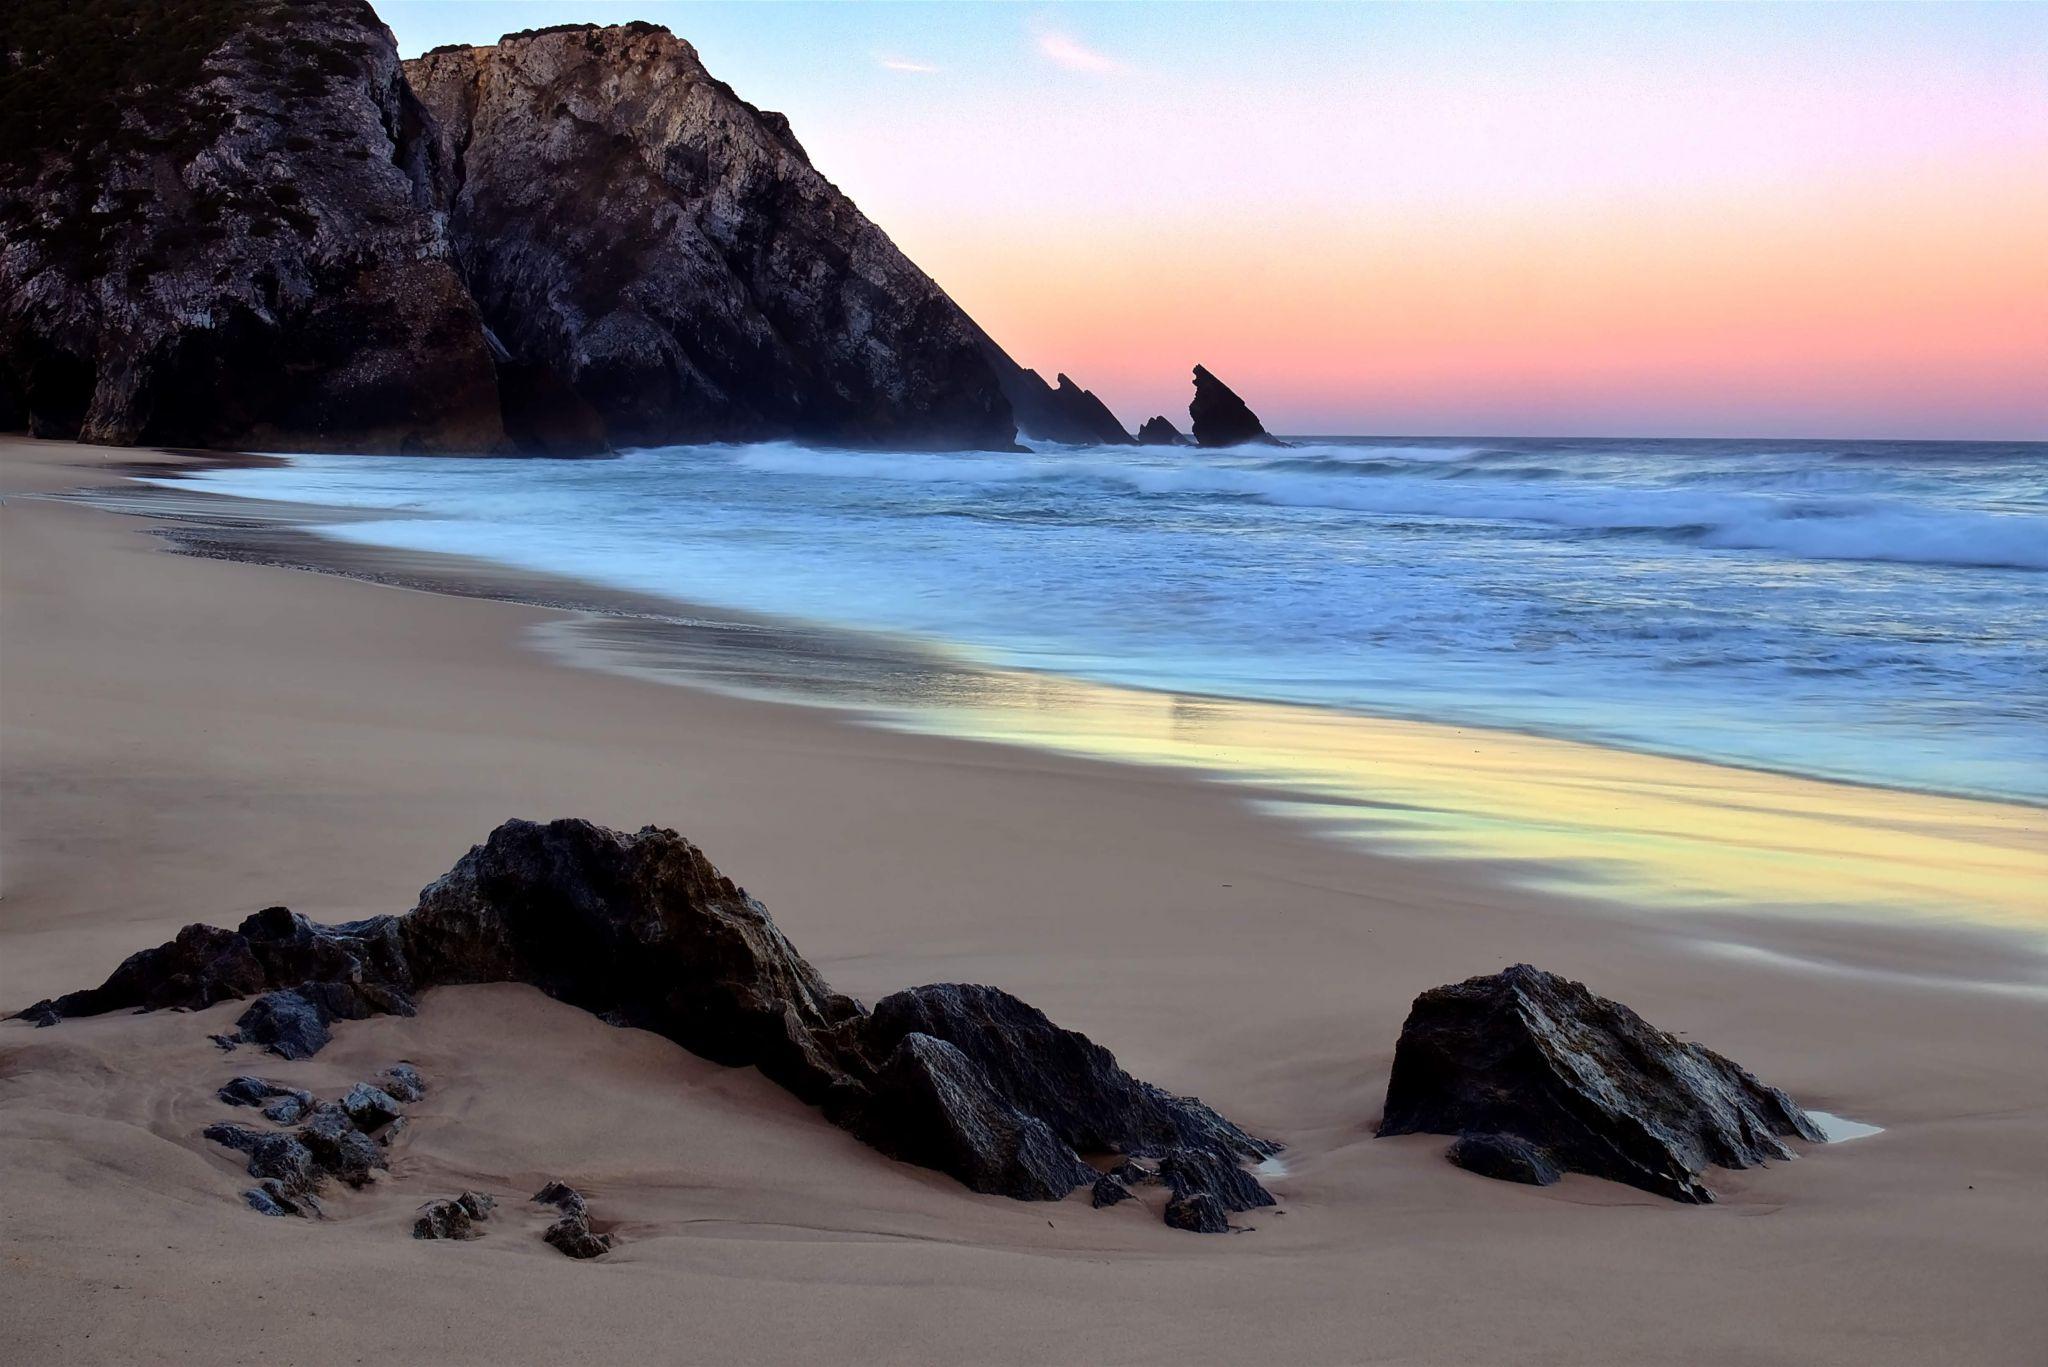 Beach in Sintra, Portugal, Portugal